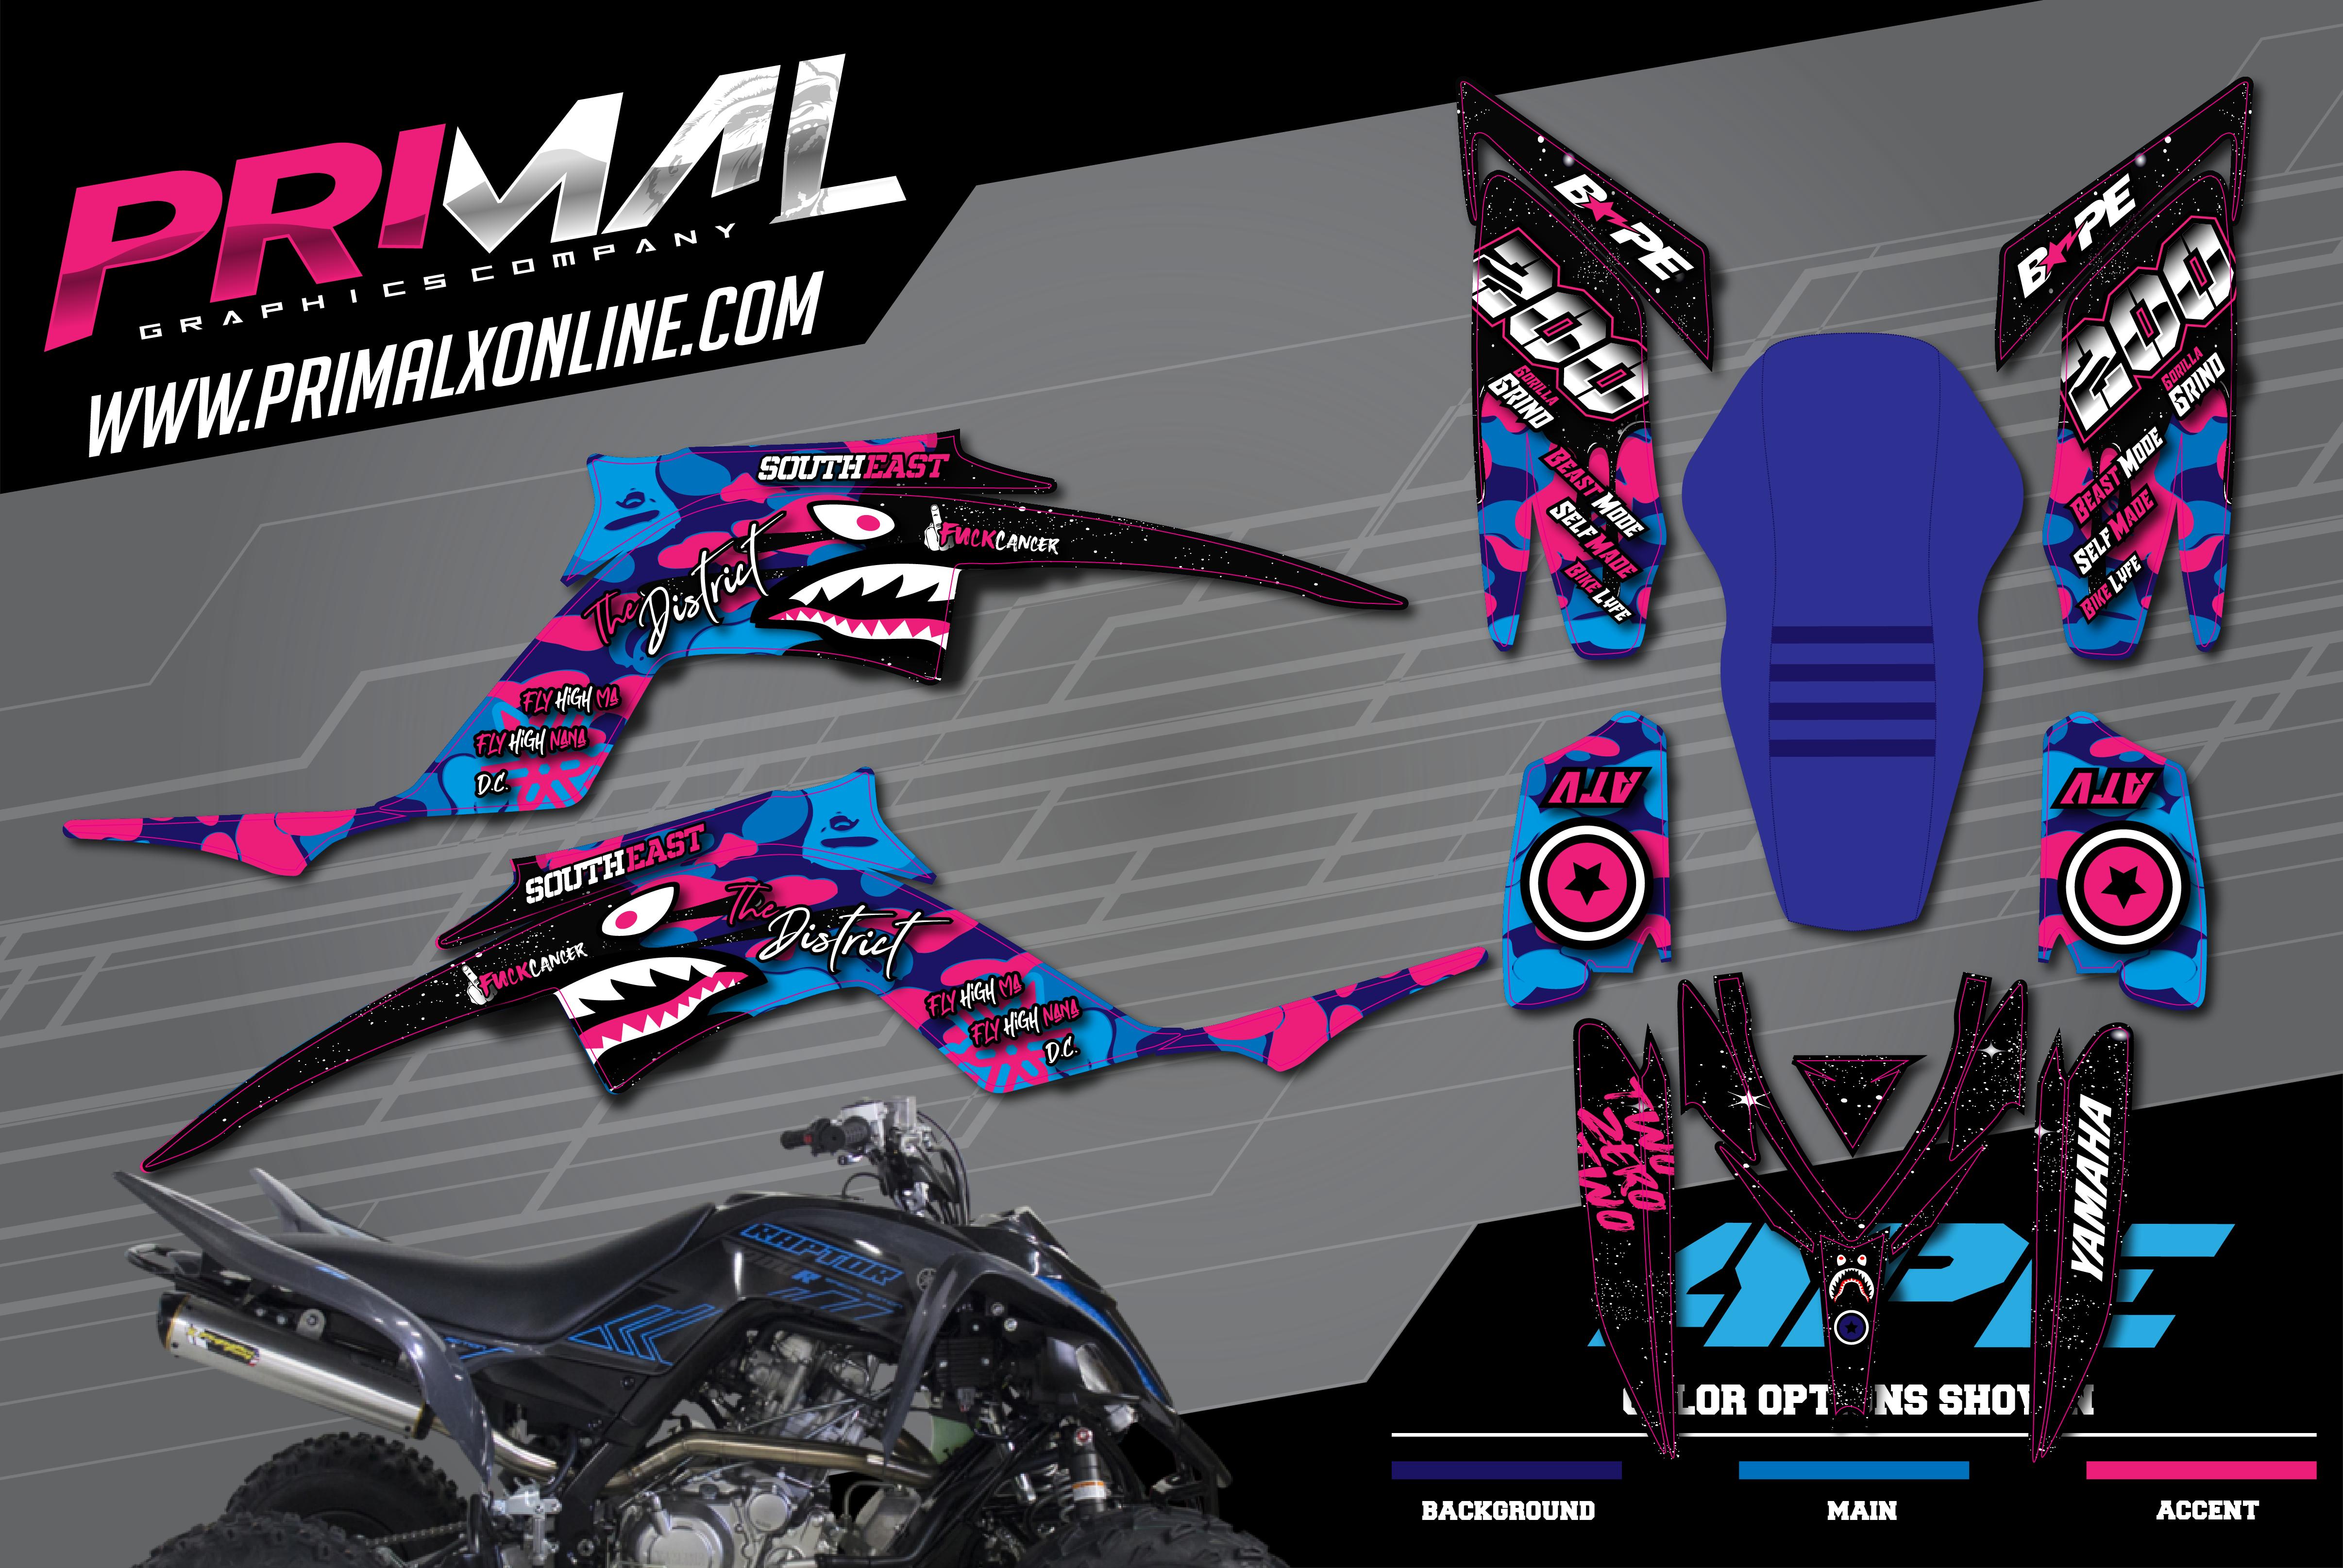 PRIMAL-X-MOTORSPORTS-PRIMAL-GRAPHICS-CO-2021-YAMAHA-RAPTOR-MOTOCROSS-GRAPHICS-APE-SERIES-01